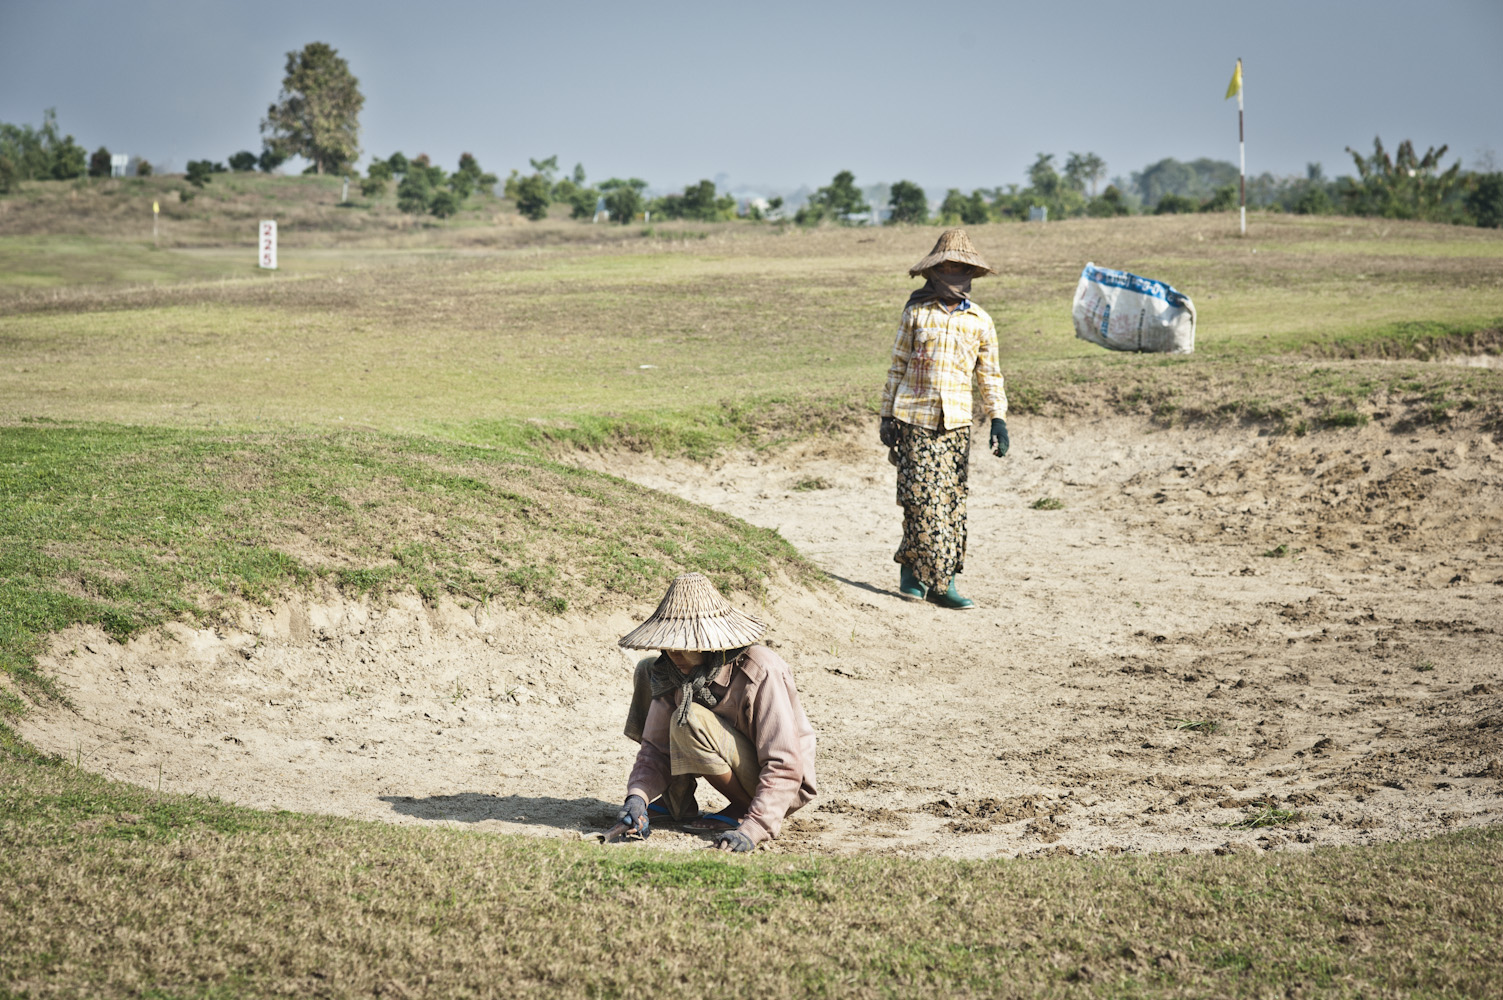 Nay Pyi Daw, cité fantome de la junte birmane